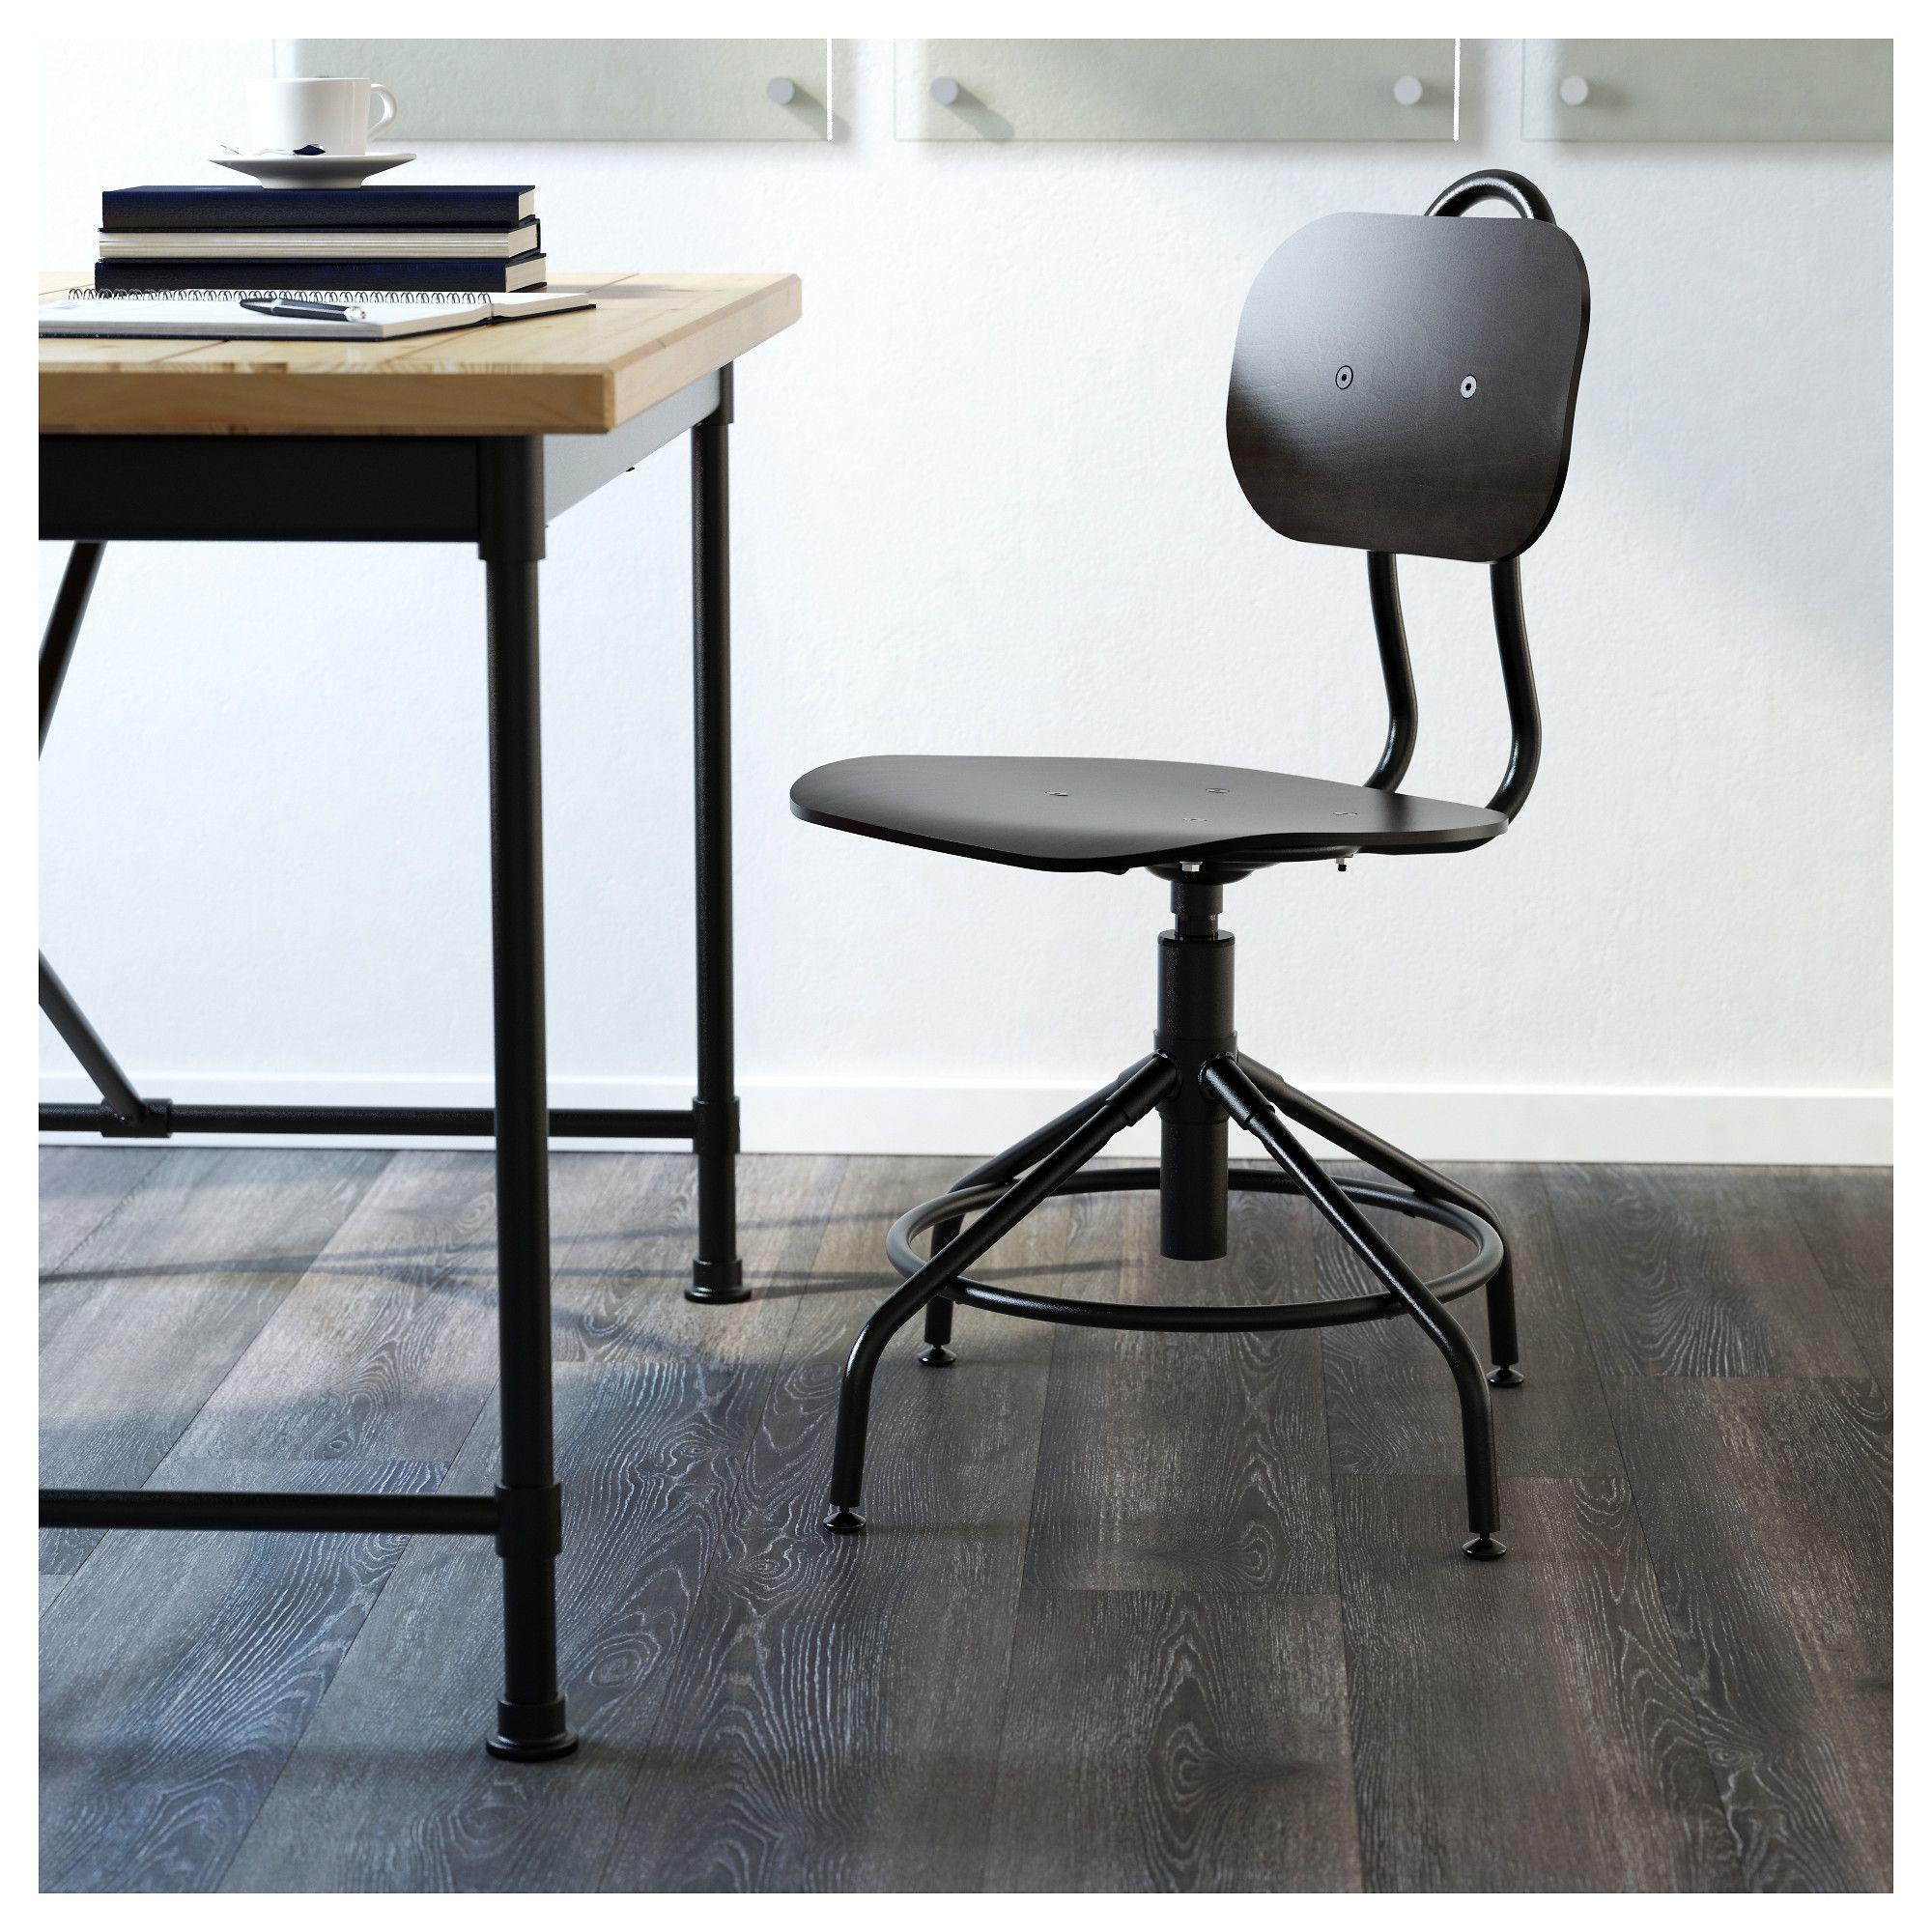 Ikea kullaberg swivel chair black swivel chair chair